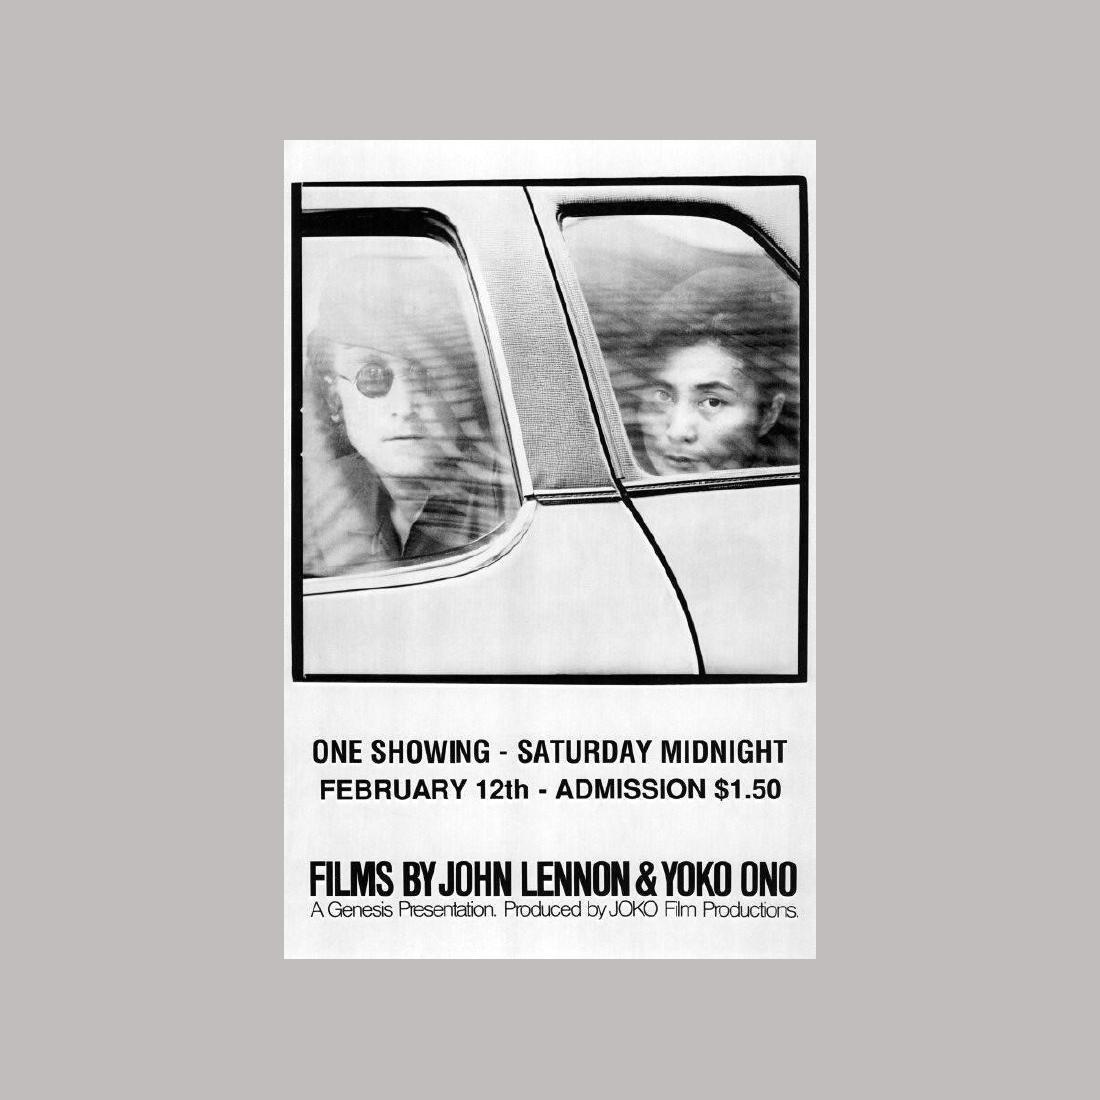 John Lennon - Films By John Lennon & Yoko Ono - 1972